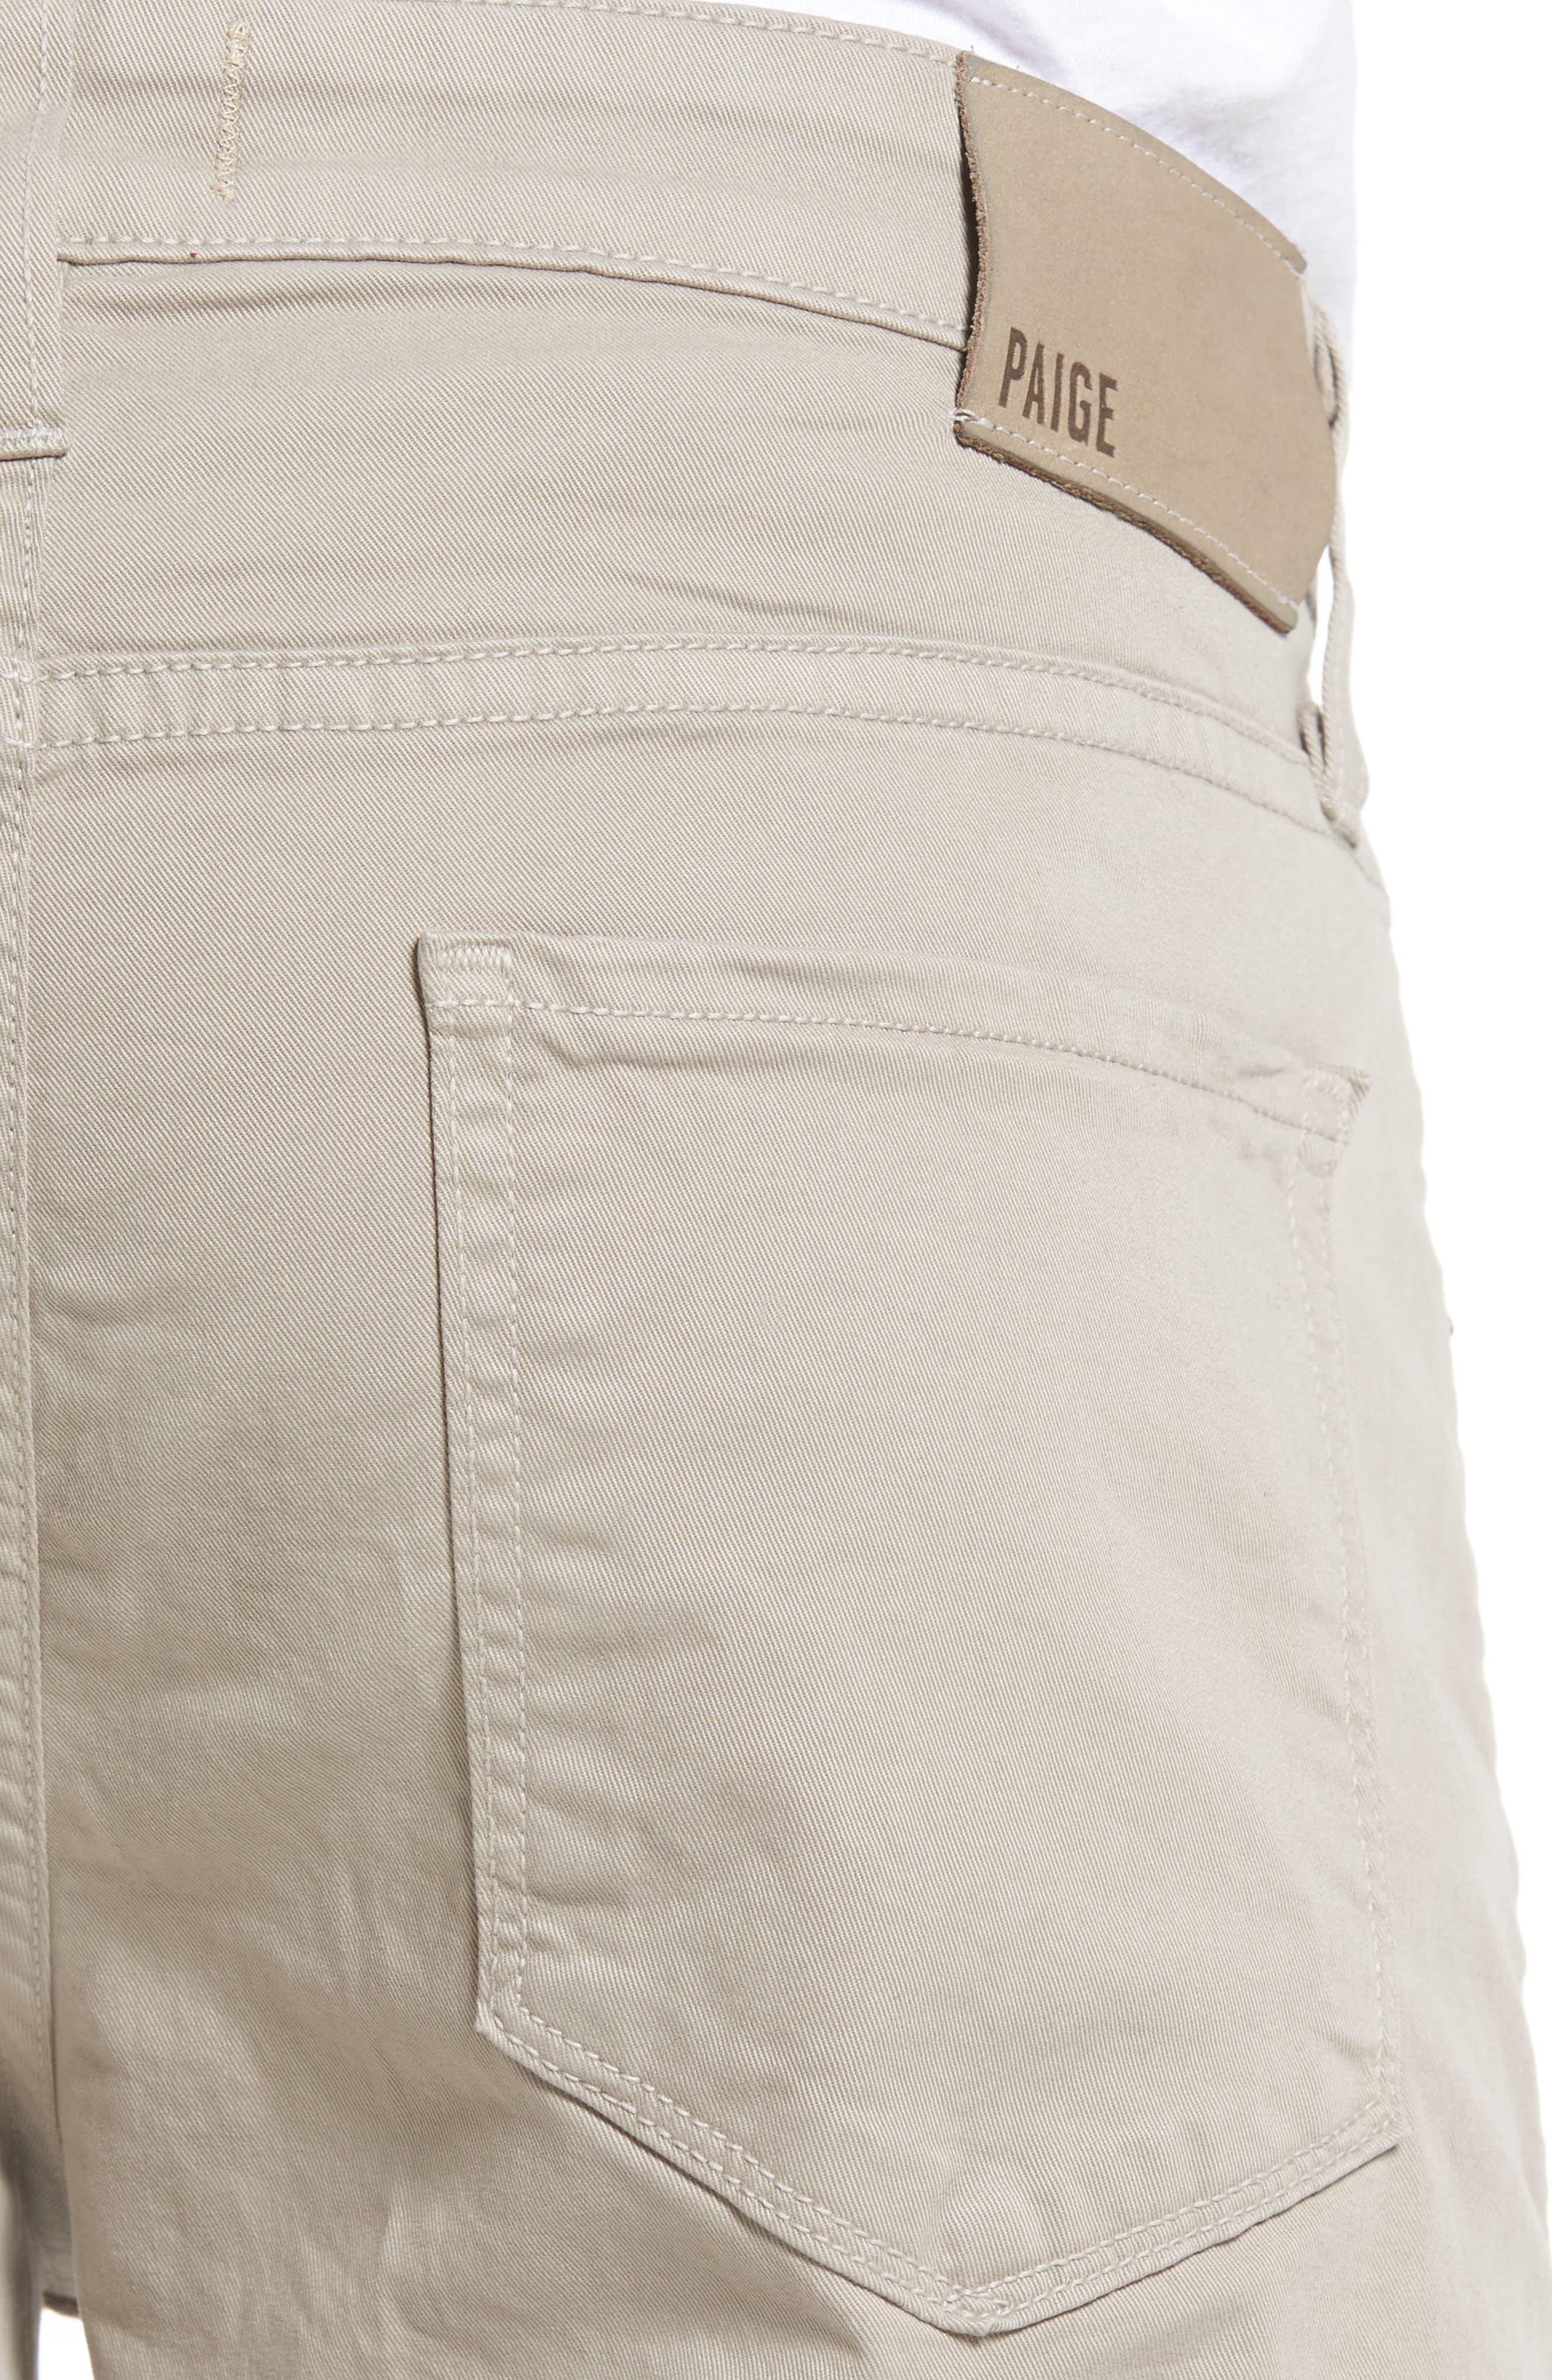 Lennox Skinny Fit Pants,                             Alternate thumbnail 4, color,                             Grey Coast